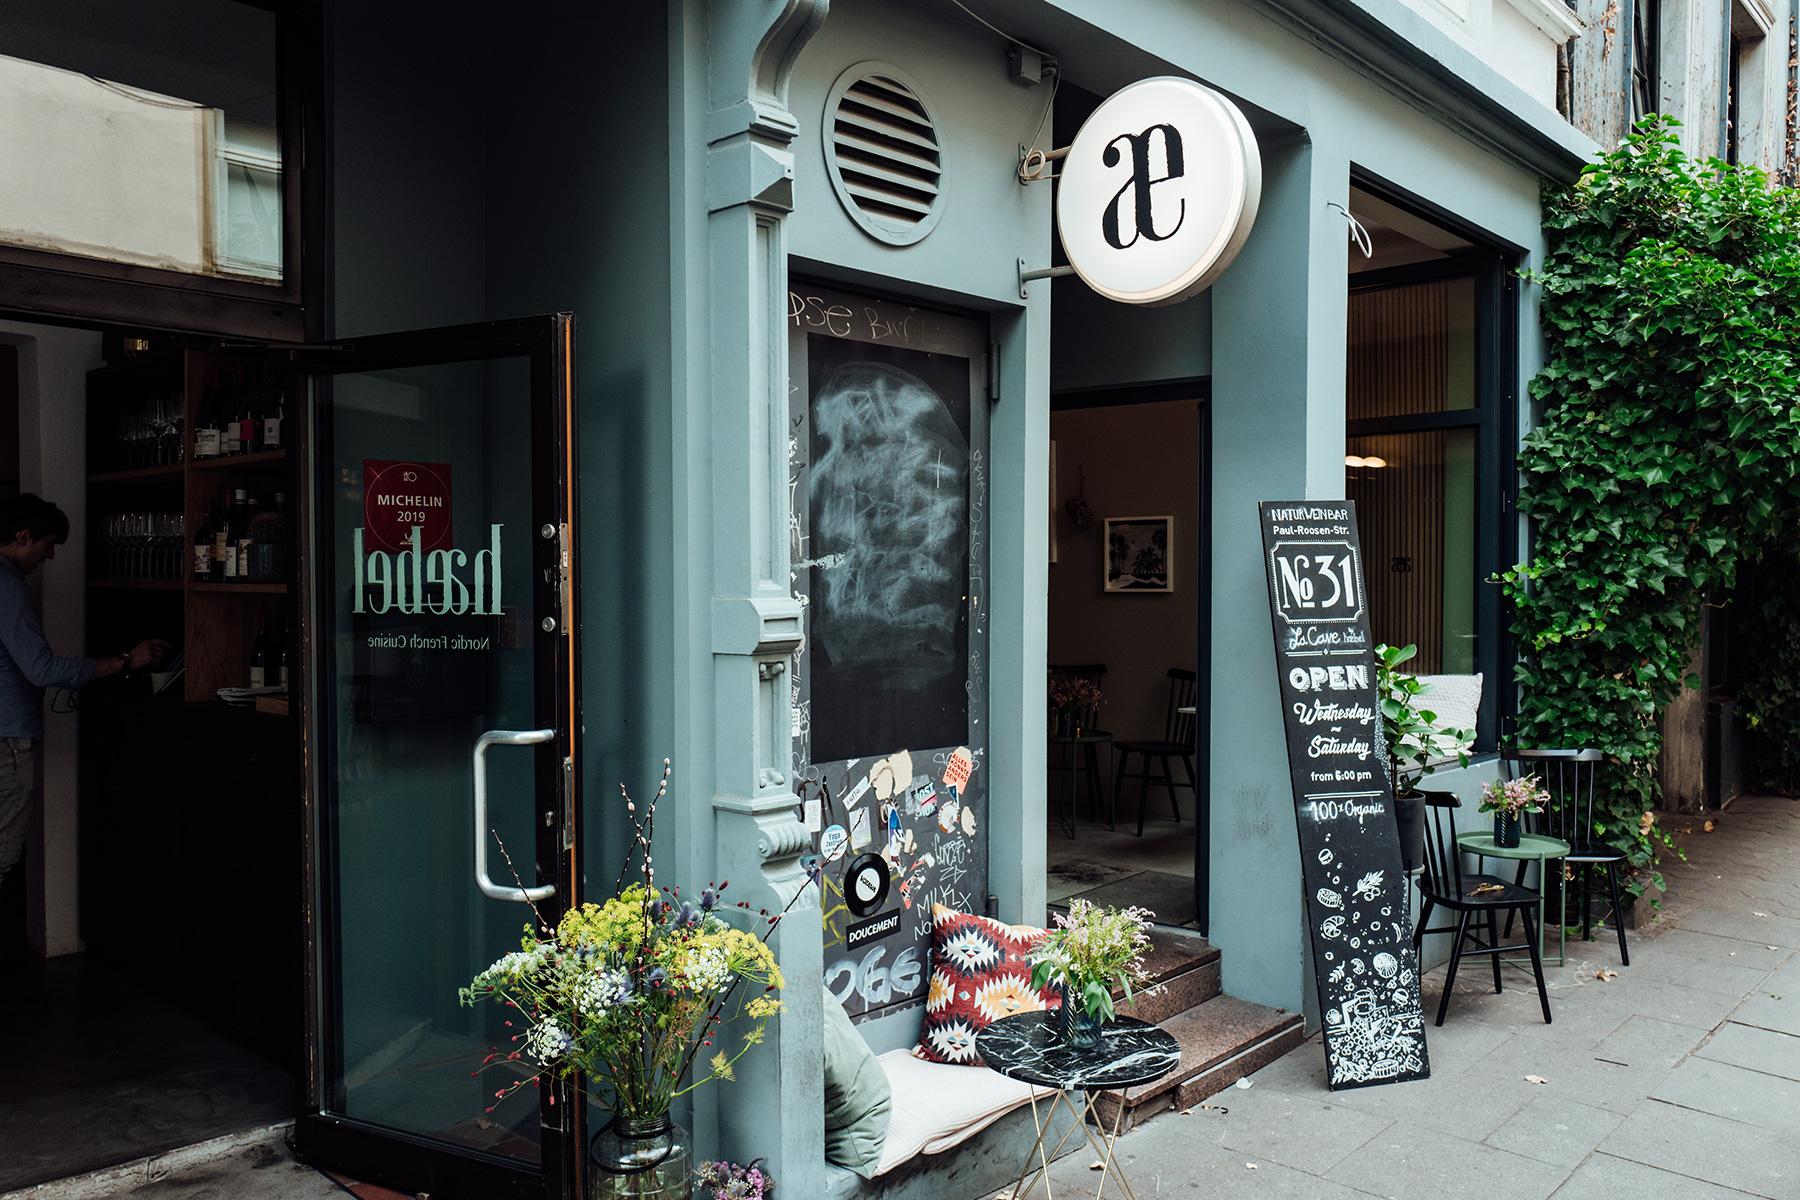 Geheimtipp Hamburg St Pauli Restaurant Haebel Lisa Knauer 6